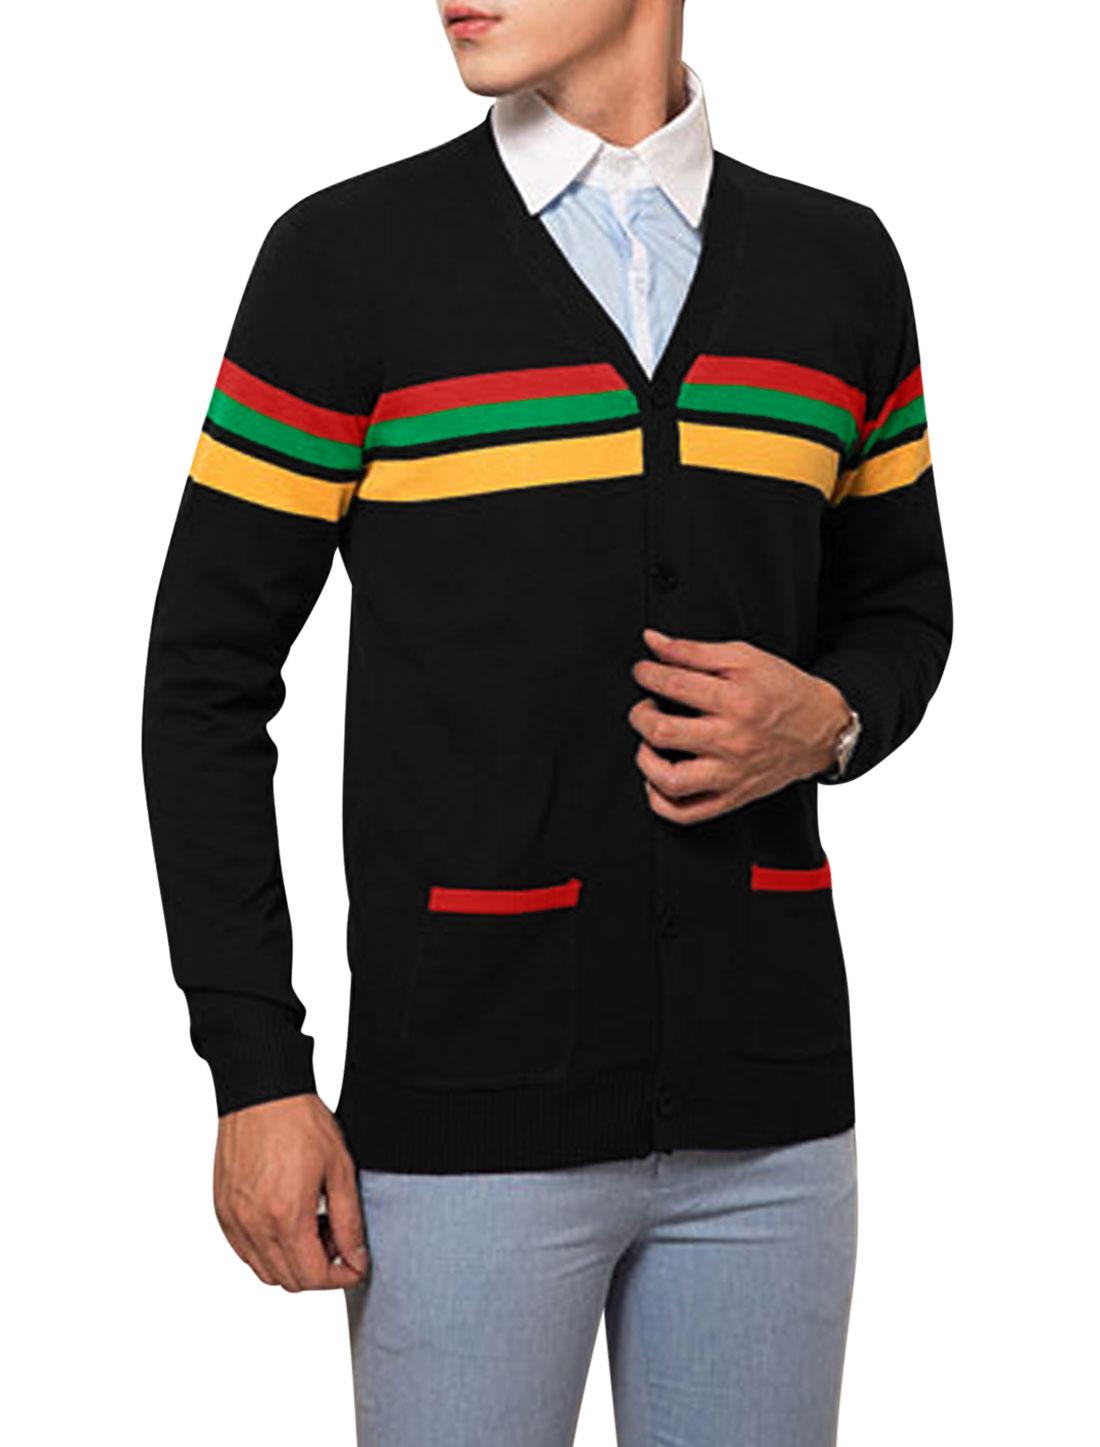 Men Stripes Button Up Long Sleeves Cardigan Sweater Black M